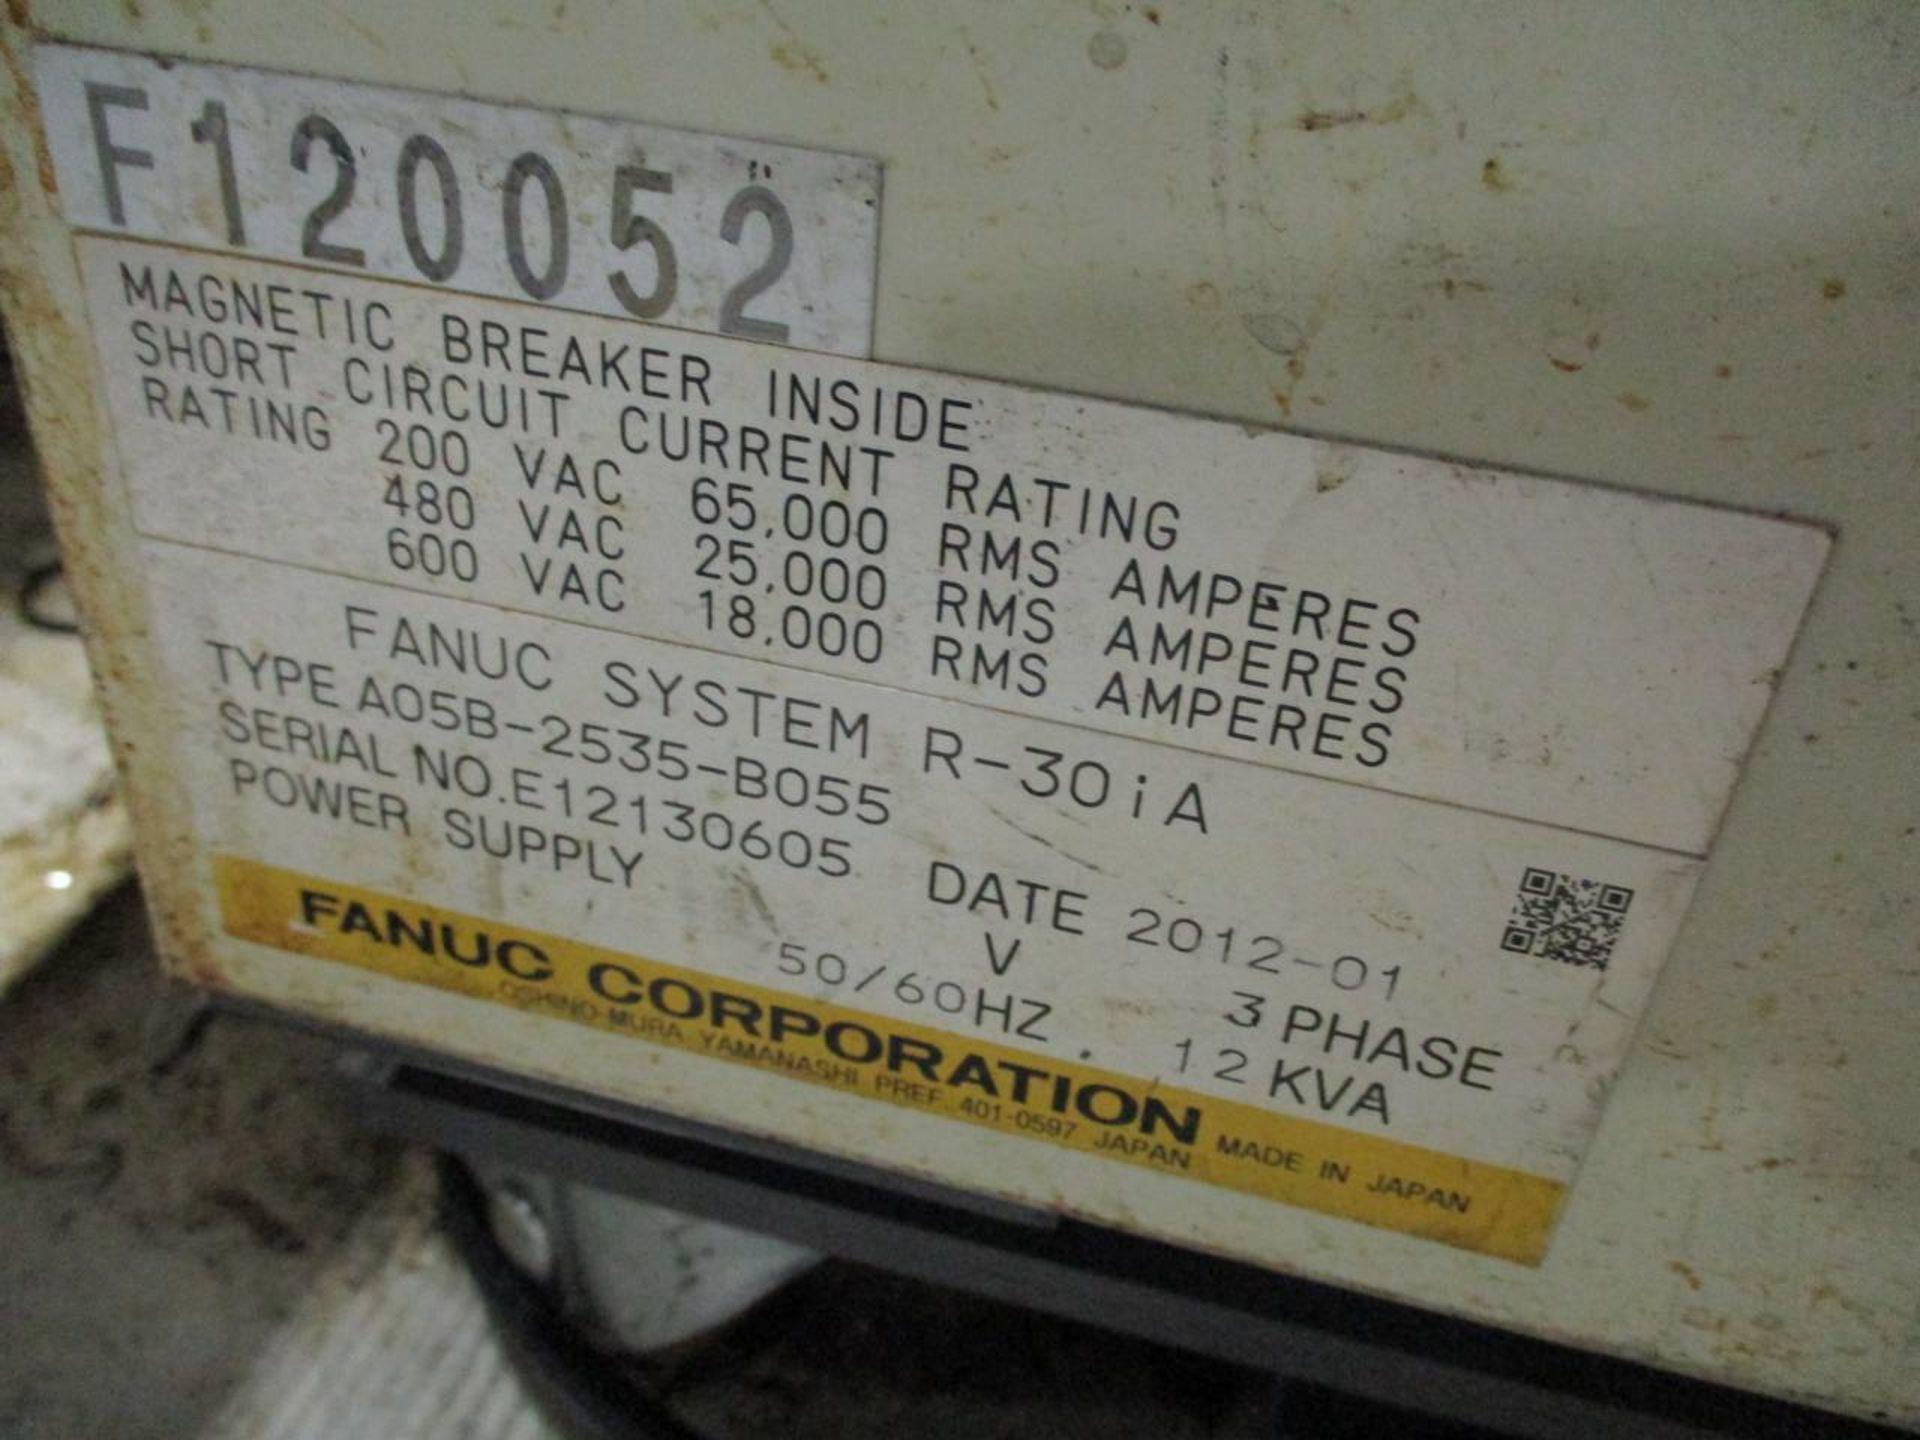 2012 Fanuc R-2000iB 165F Foundry Pro Servo Robot - Image 5 of 7